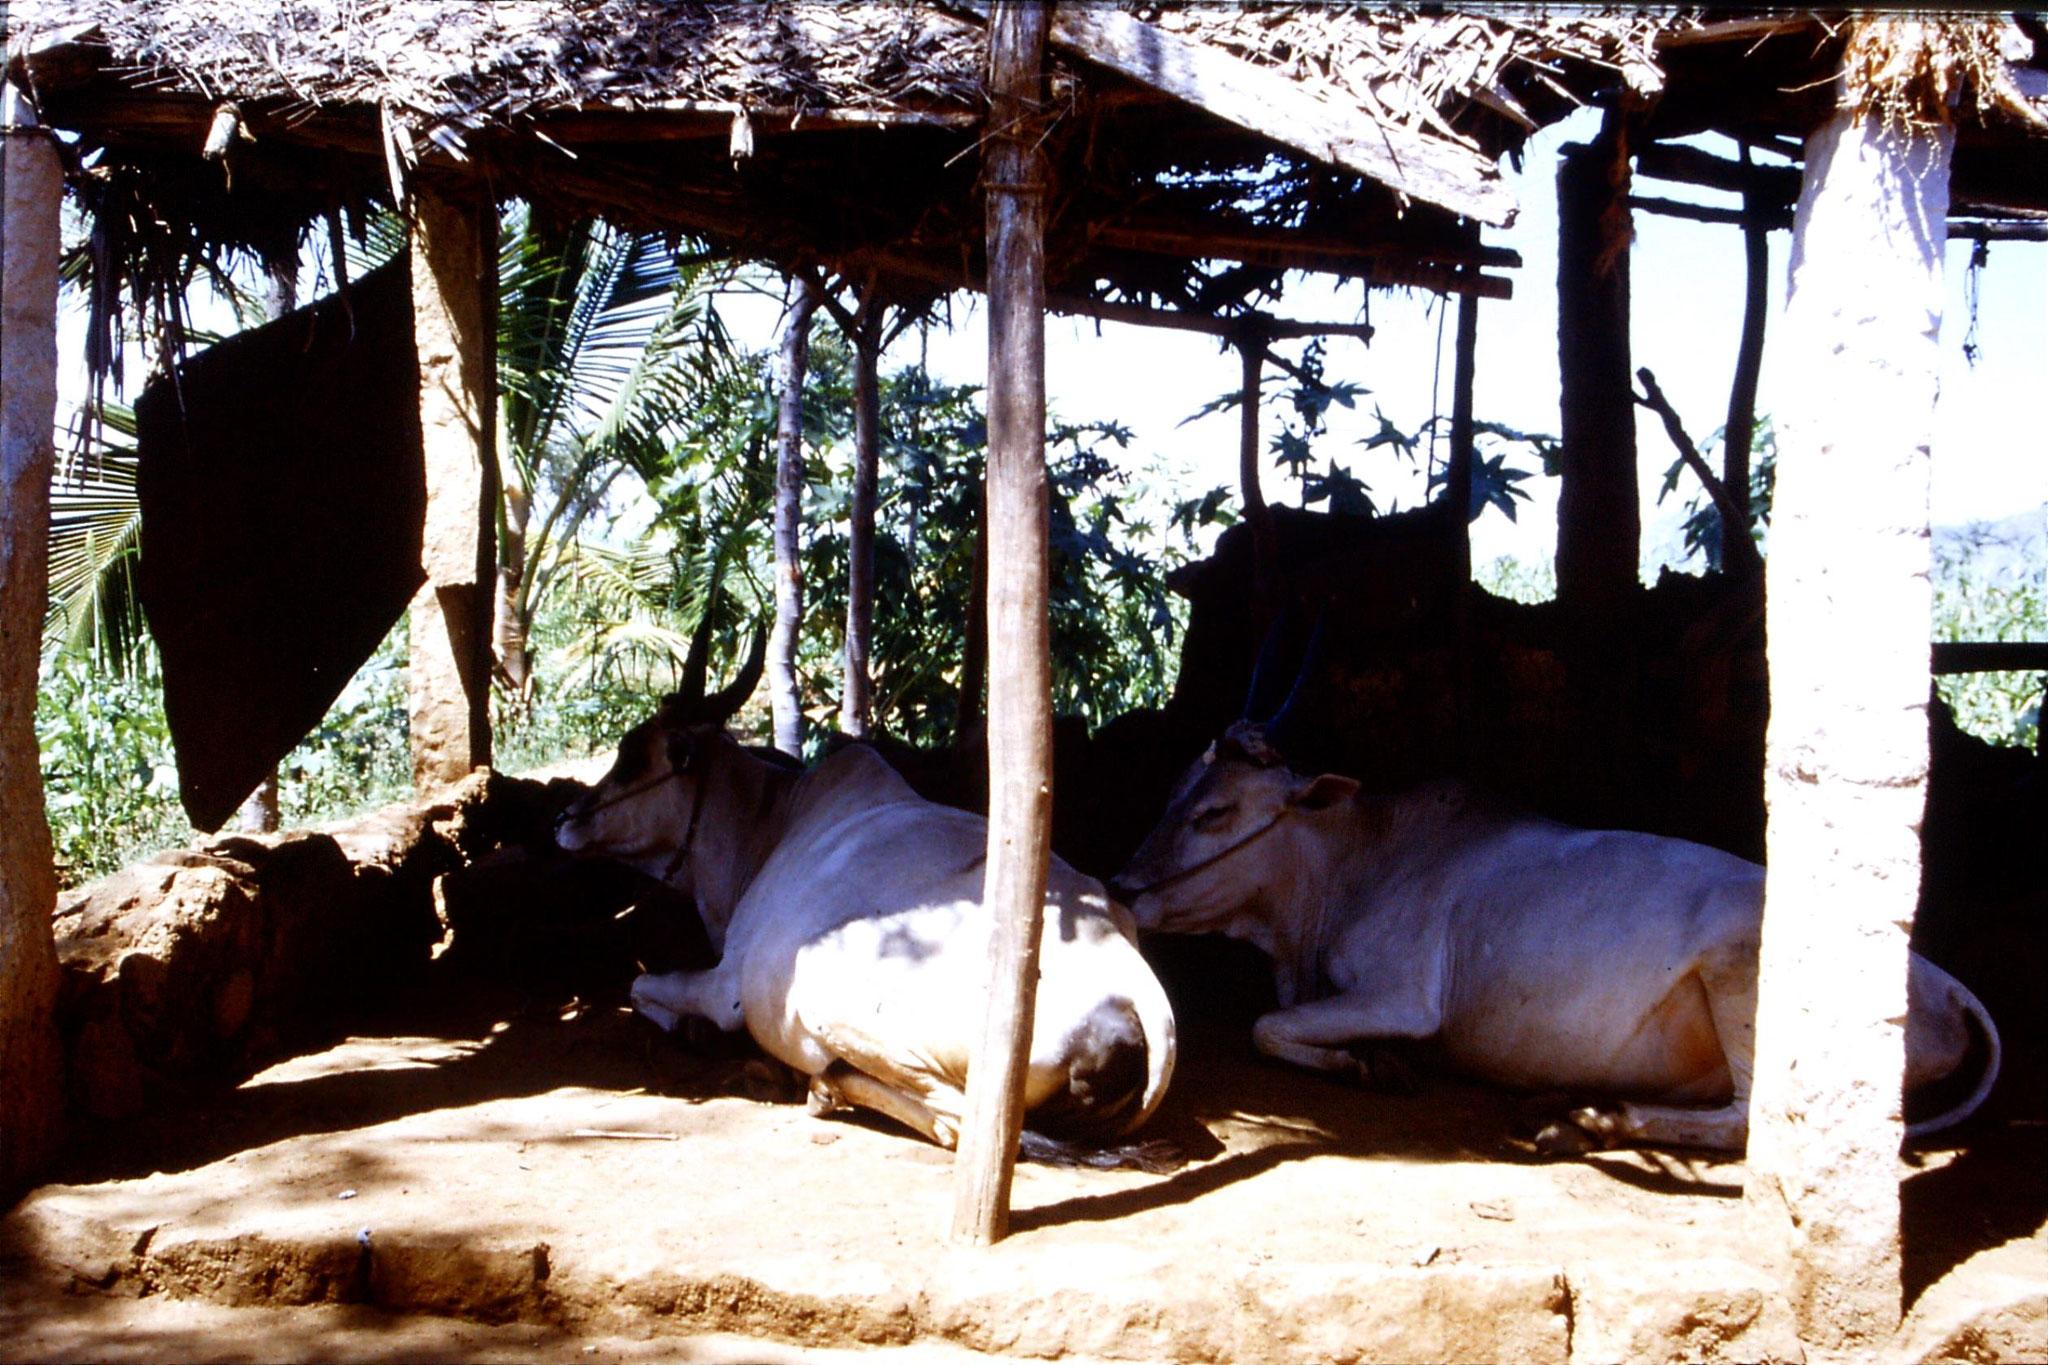 104/30: 21/2/1990 Batlagundi afforestation project